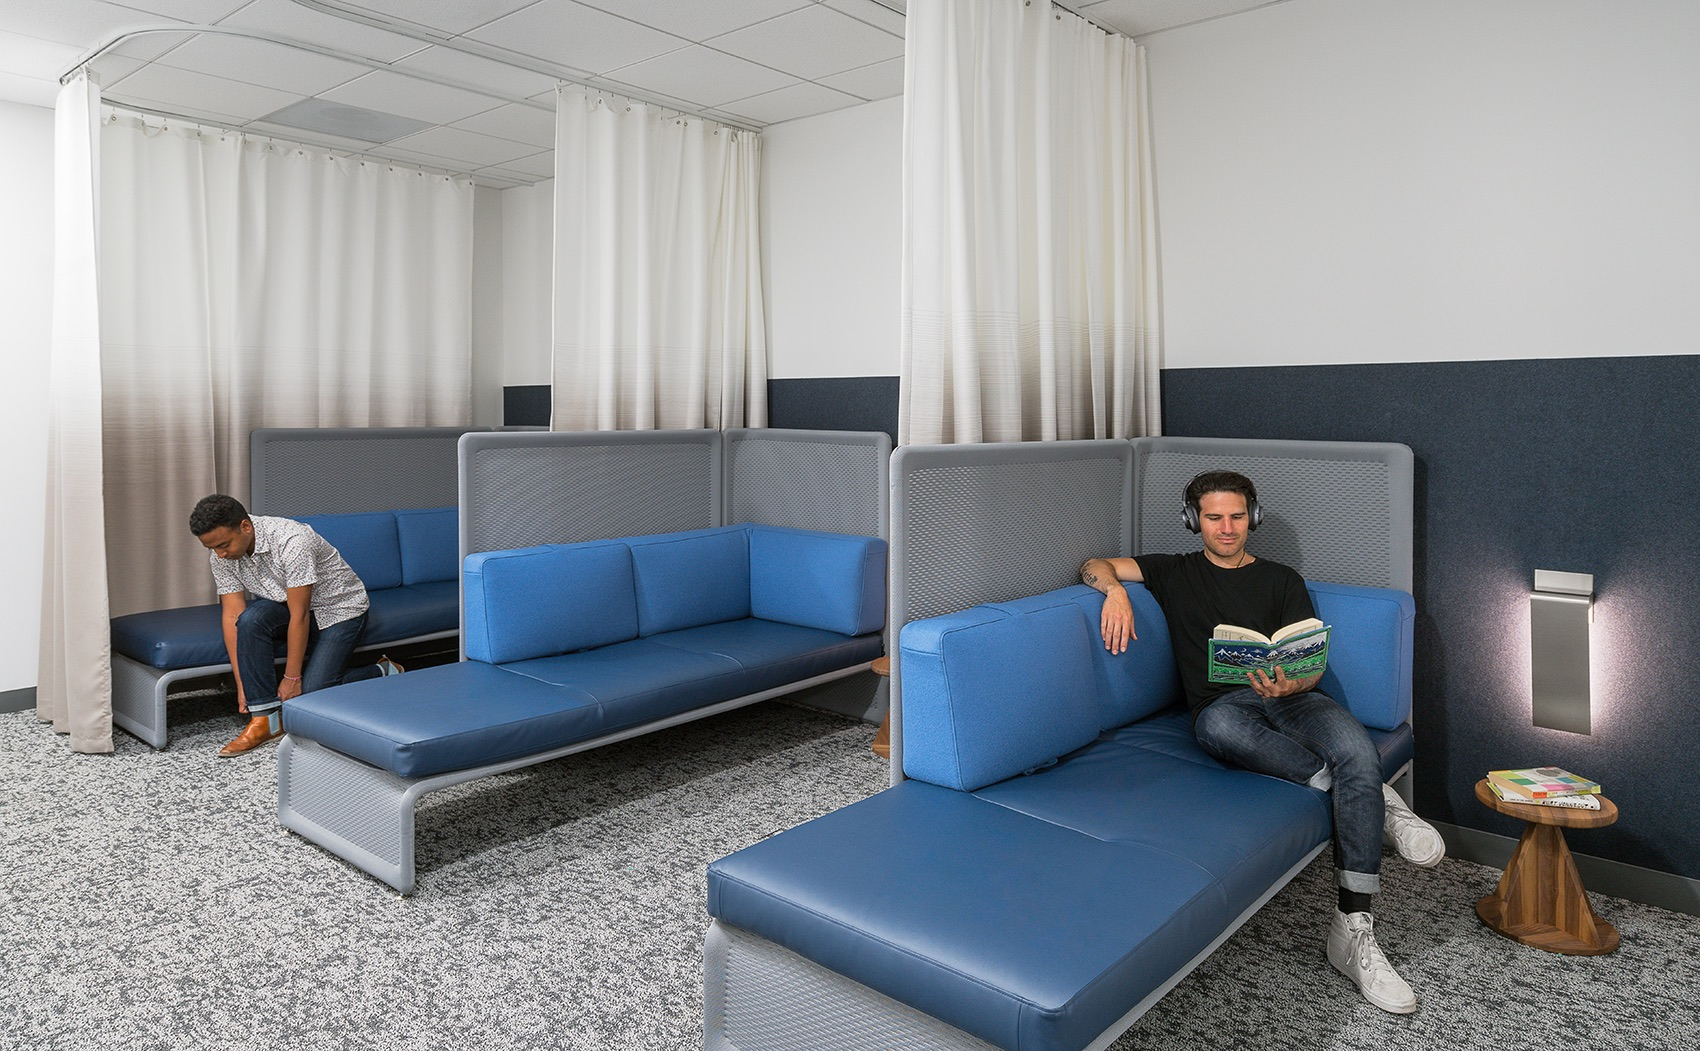 linkedin-sunnyvale-office-7